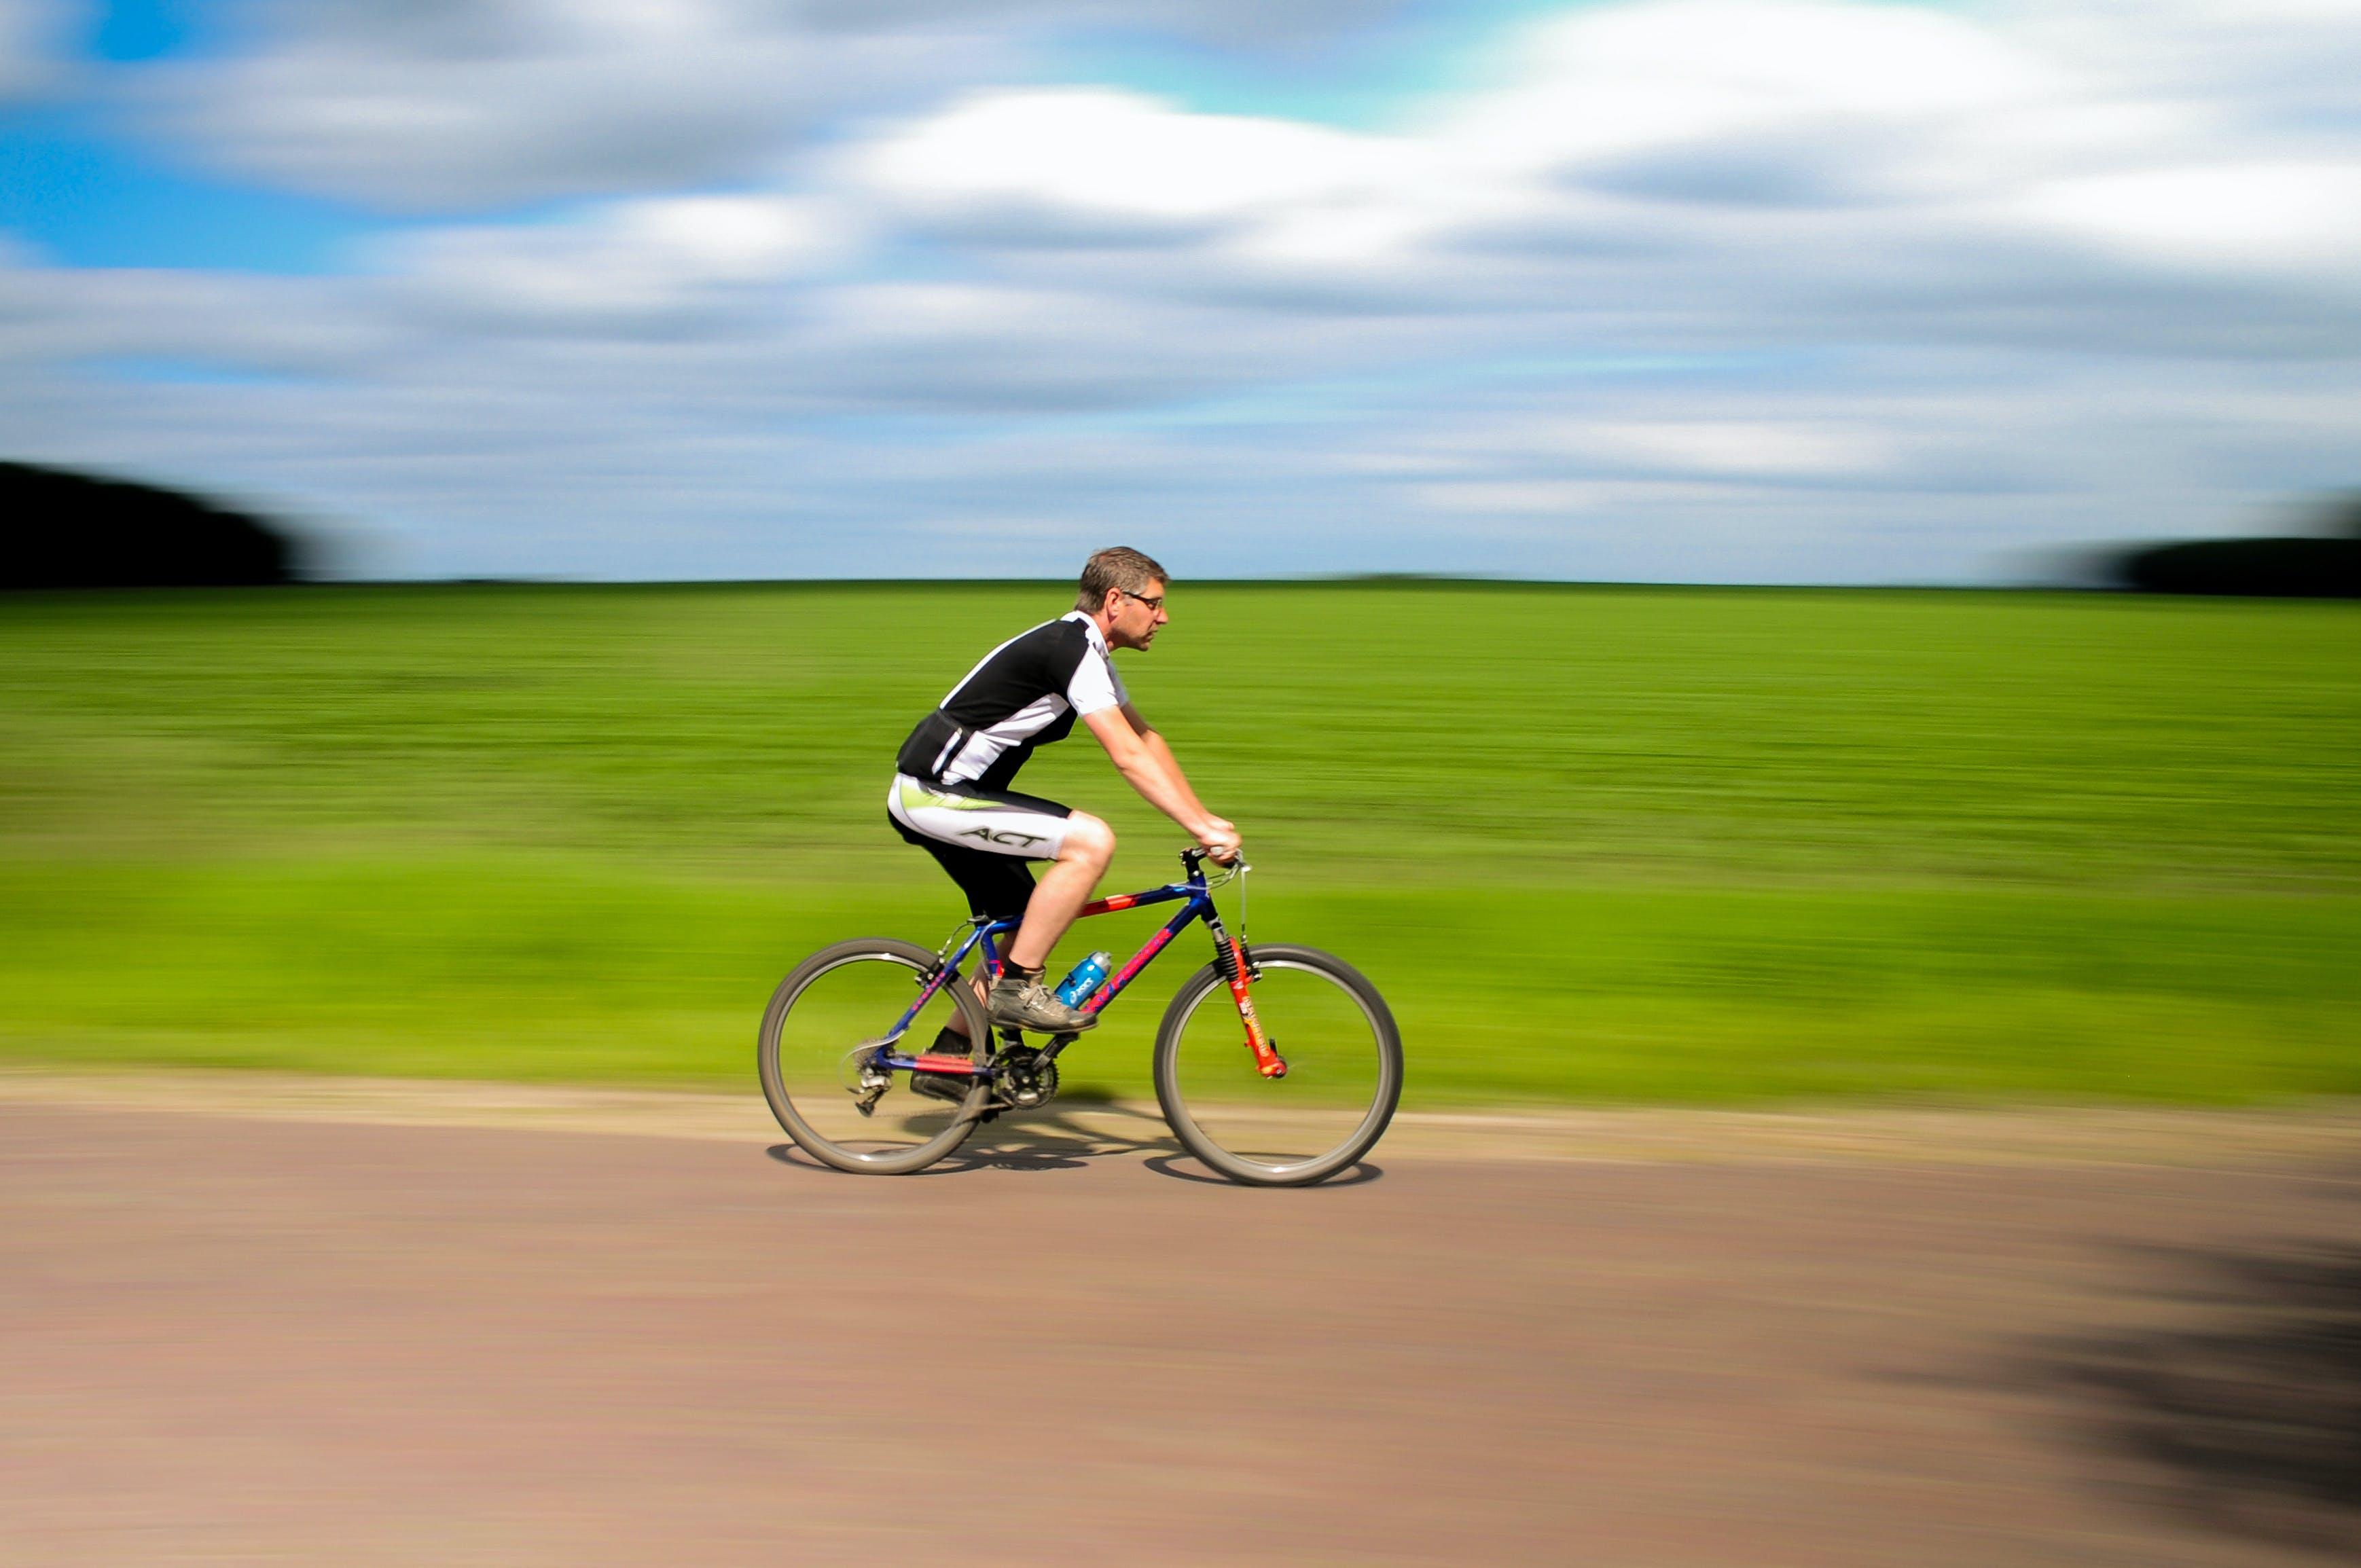 bicycle, bicyclist, bike